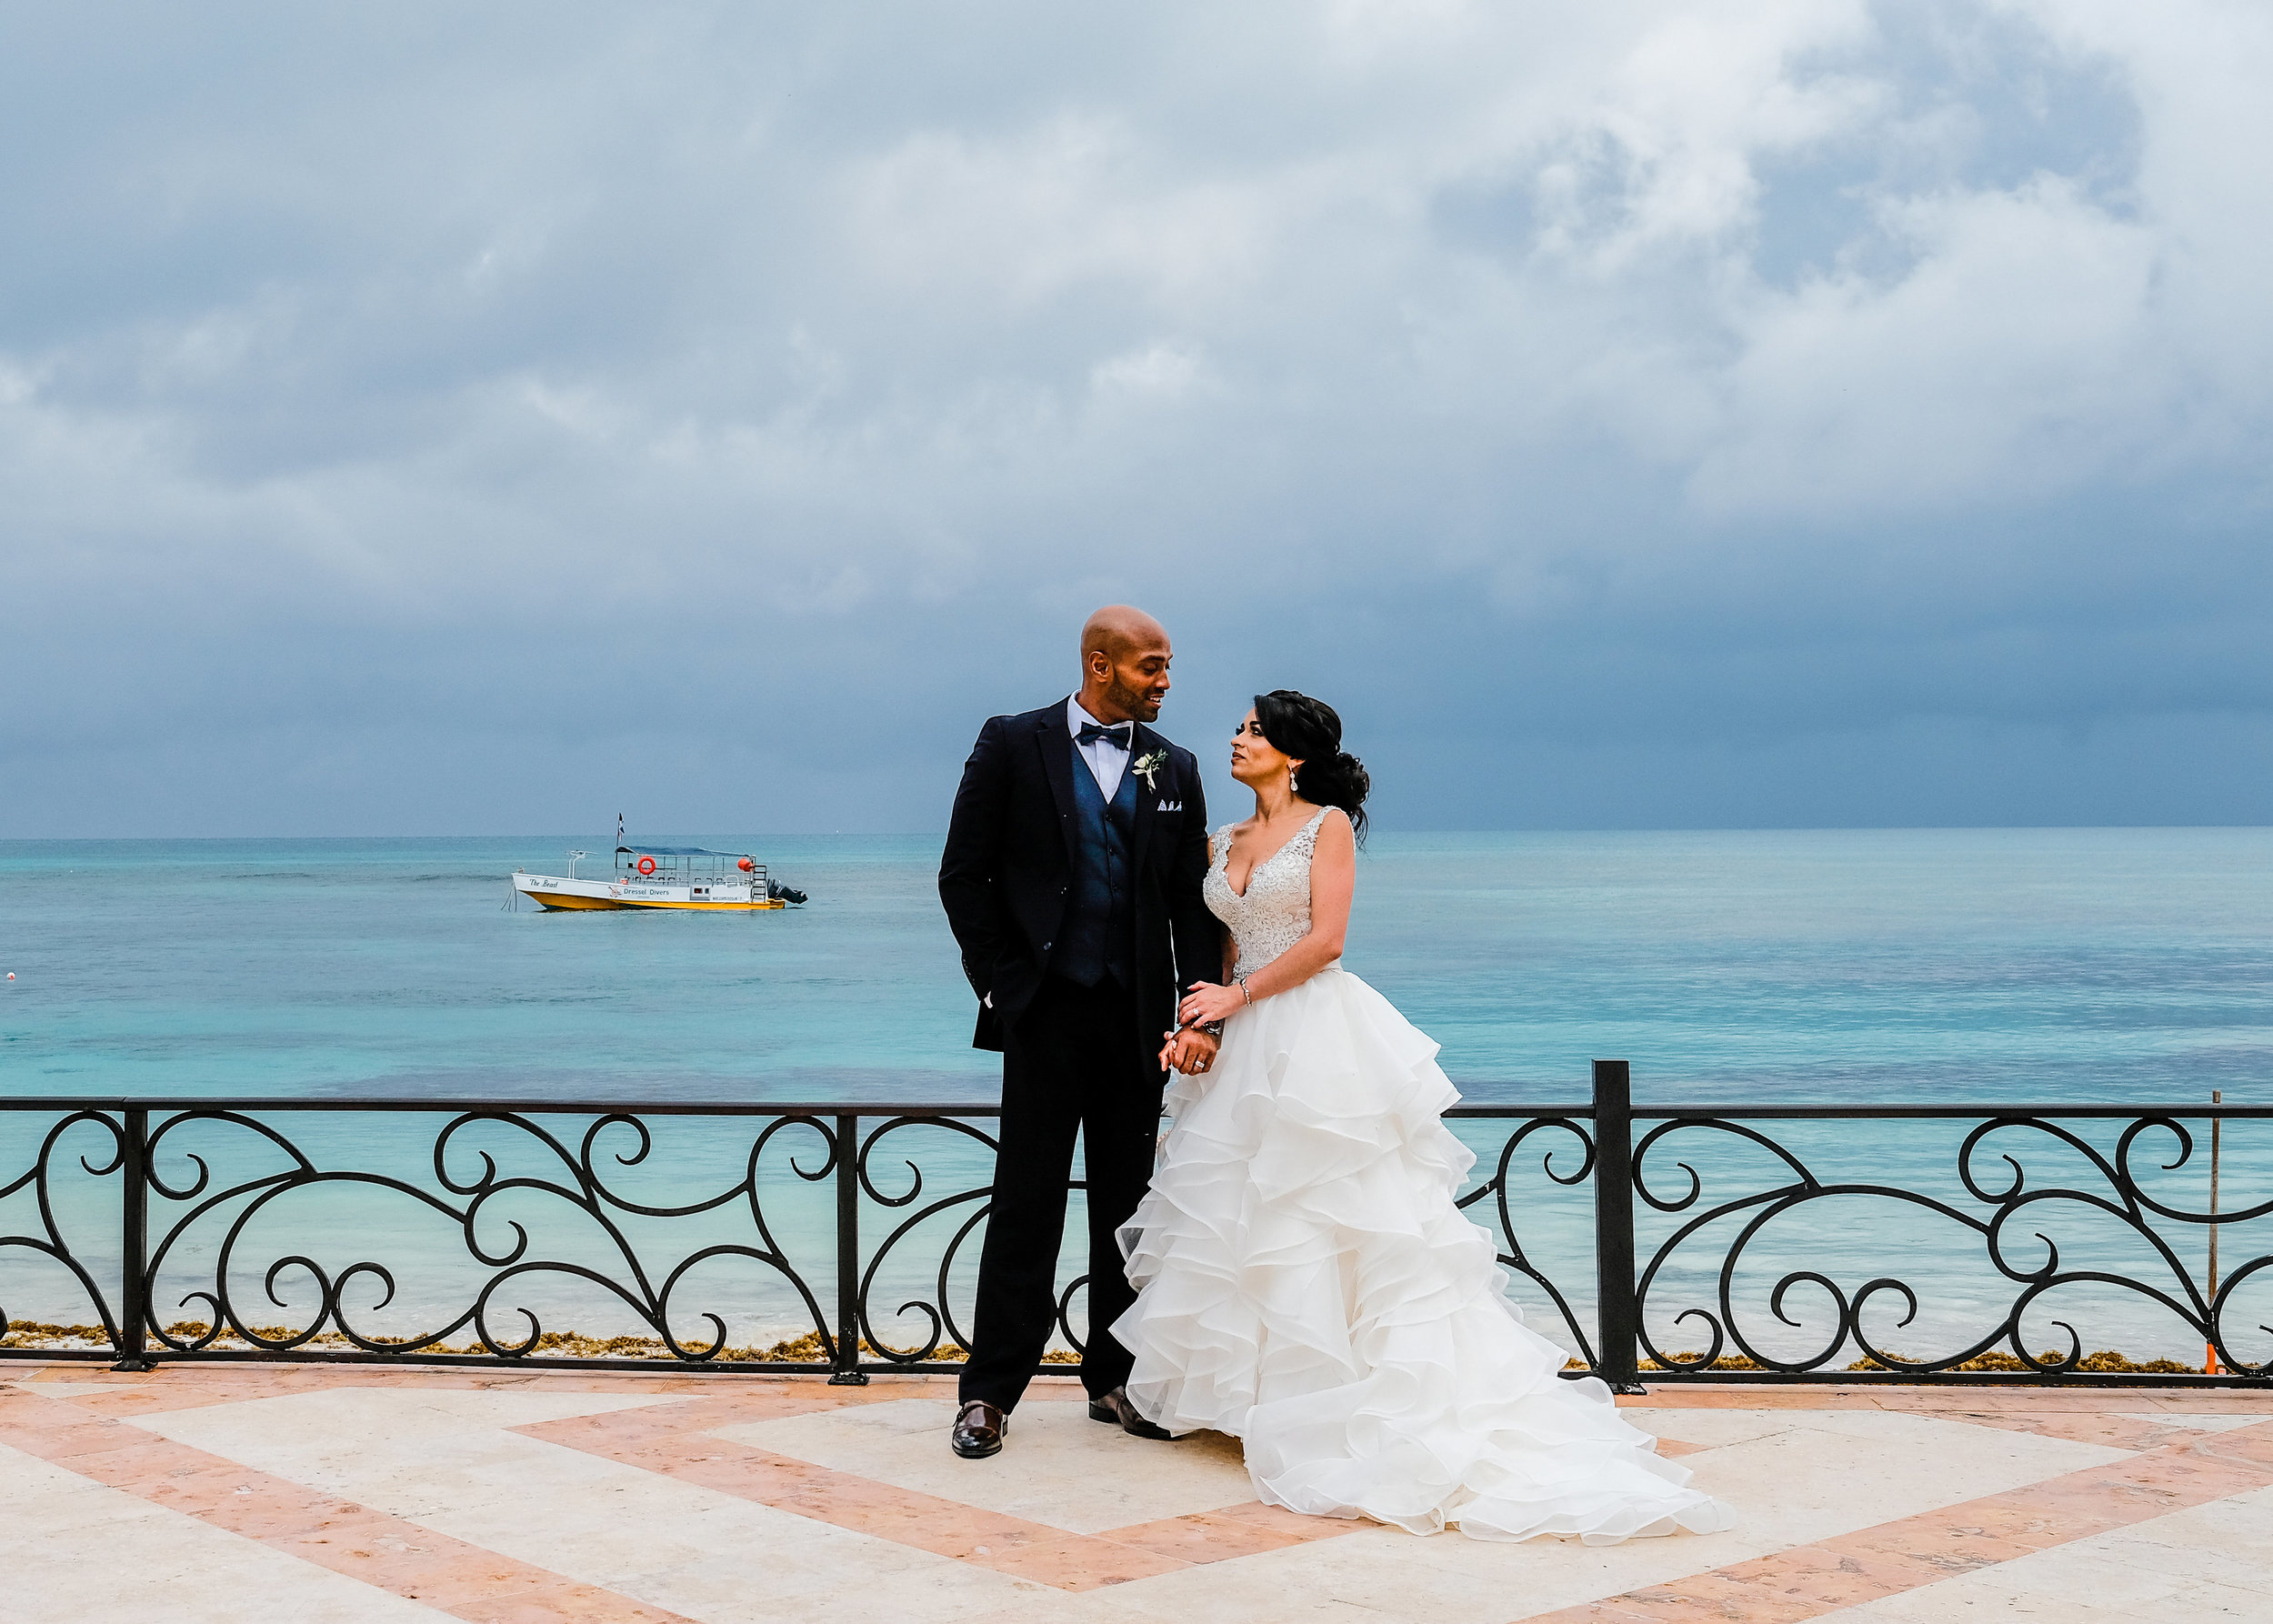 mexico_destination_wedding_villa_la_joya_cancun_40.jpg